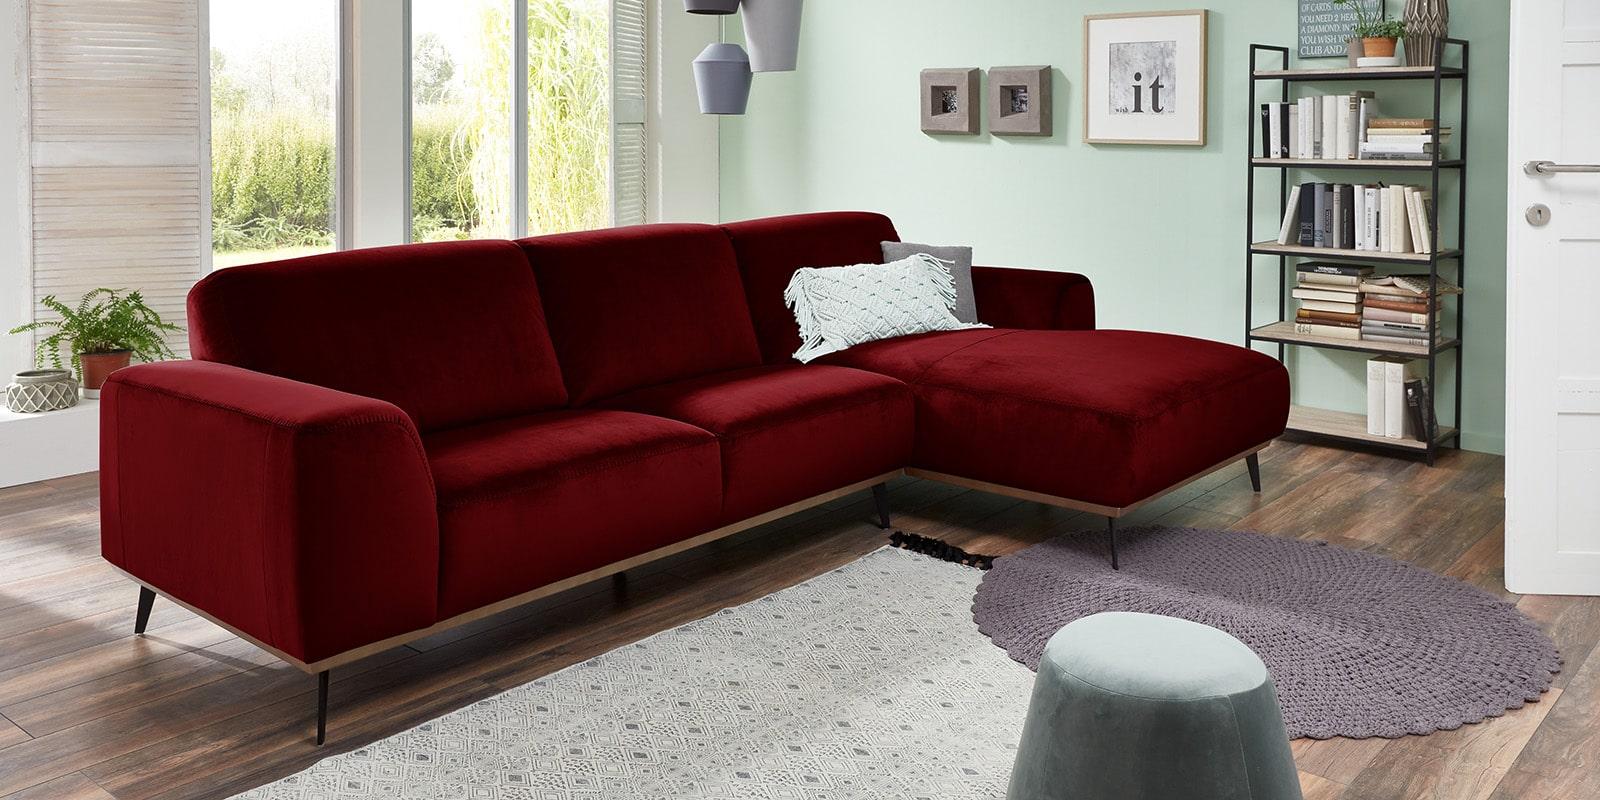 Moebella24 - Ecksofa - mit - Ottomane -Barcelona - Samt - Rot - Skandinavisches - Punto - cavallo - Nähte - Elegante - Füße